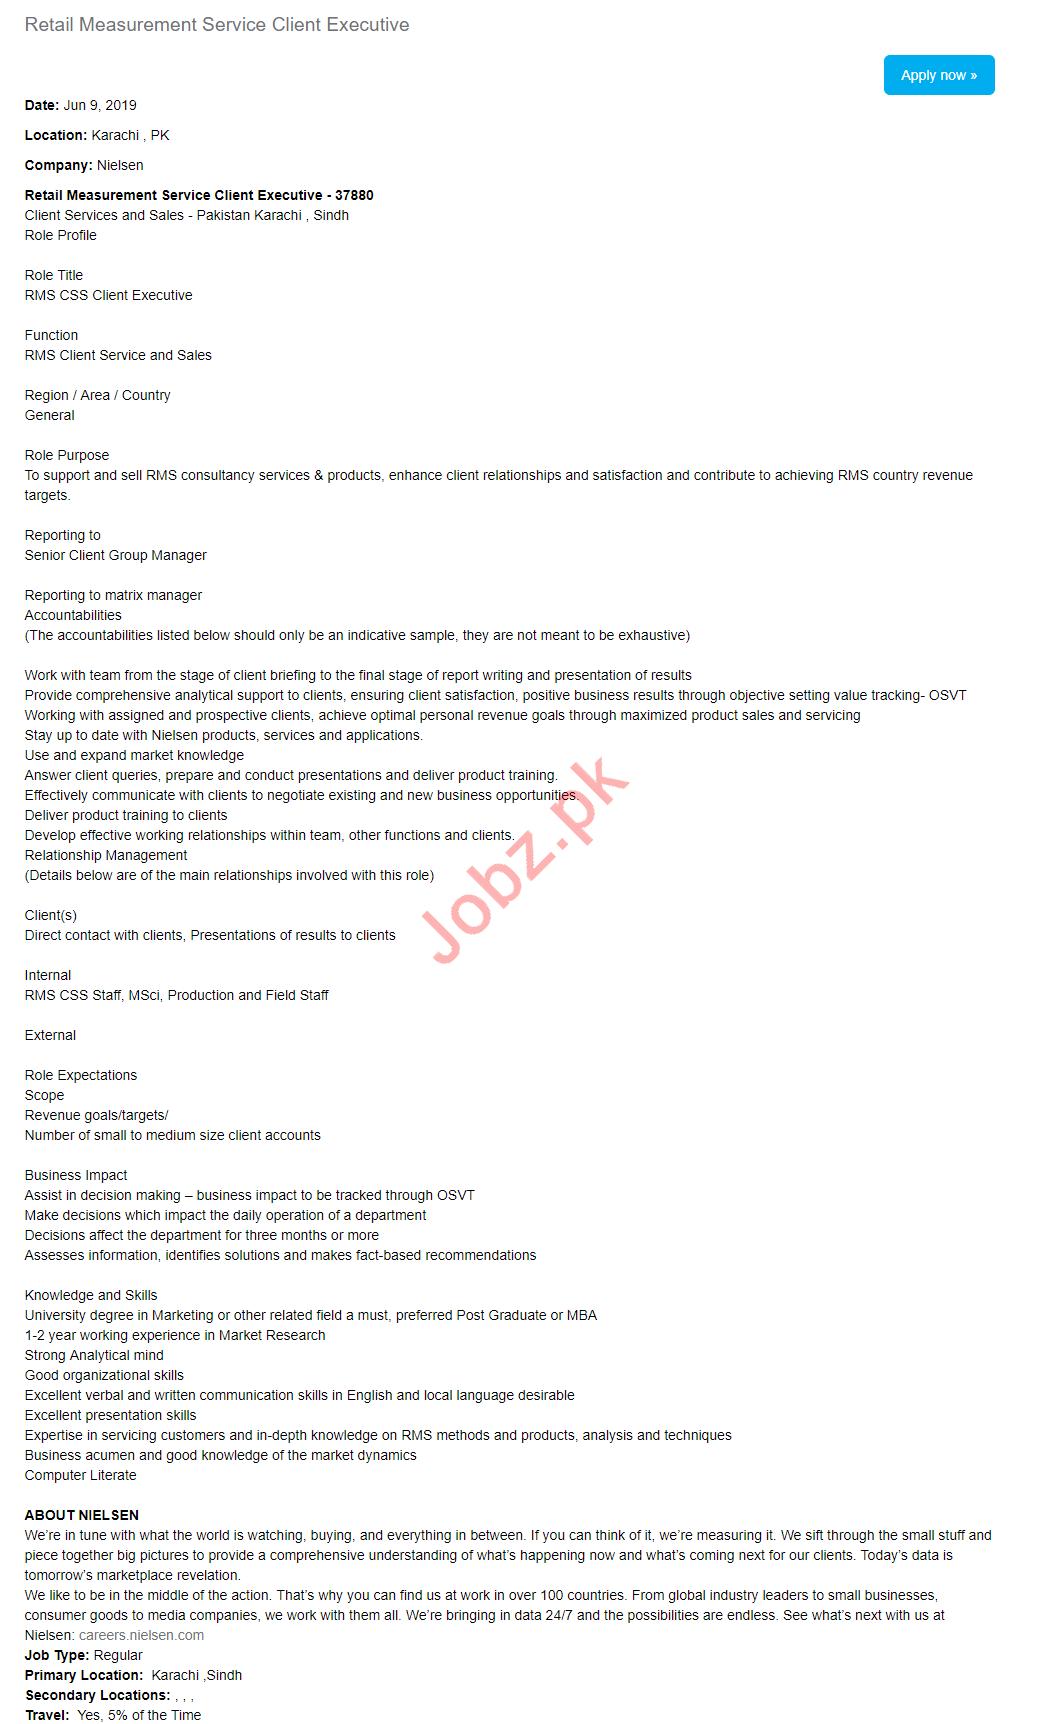 Nielsen Lahore Jobs for Client Executive